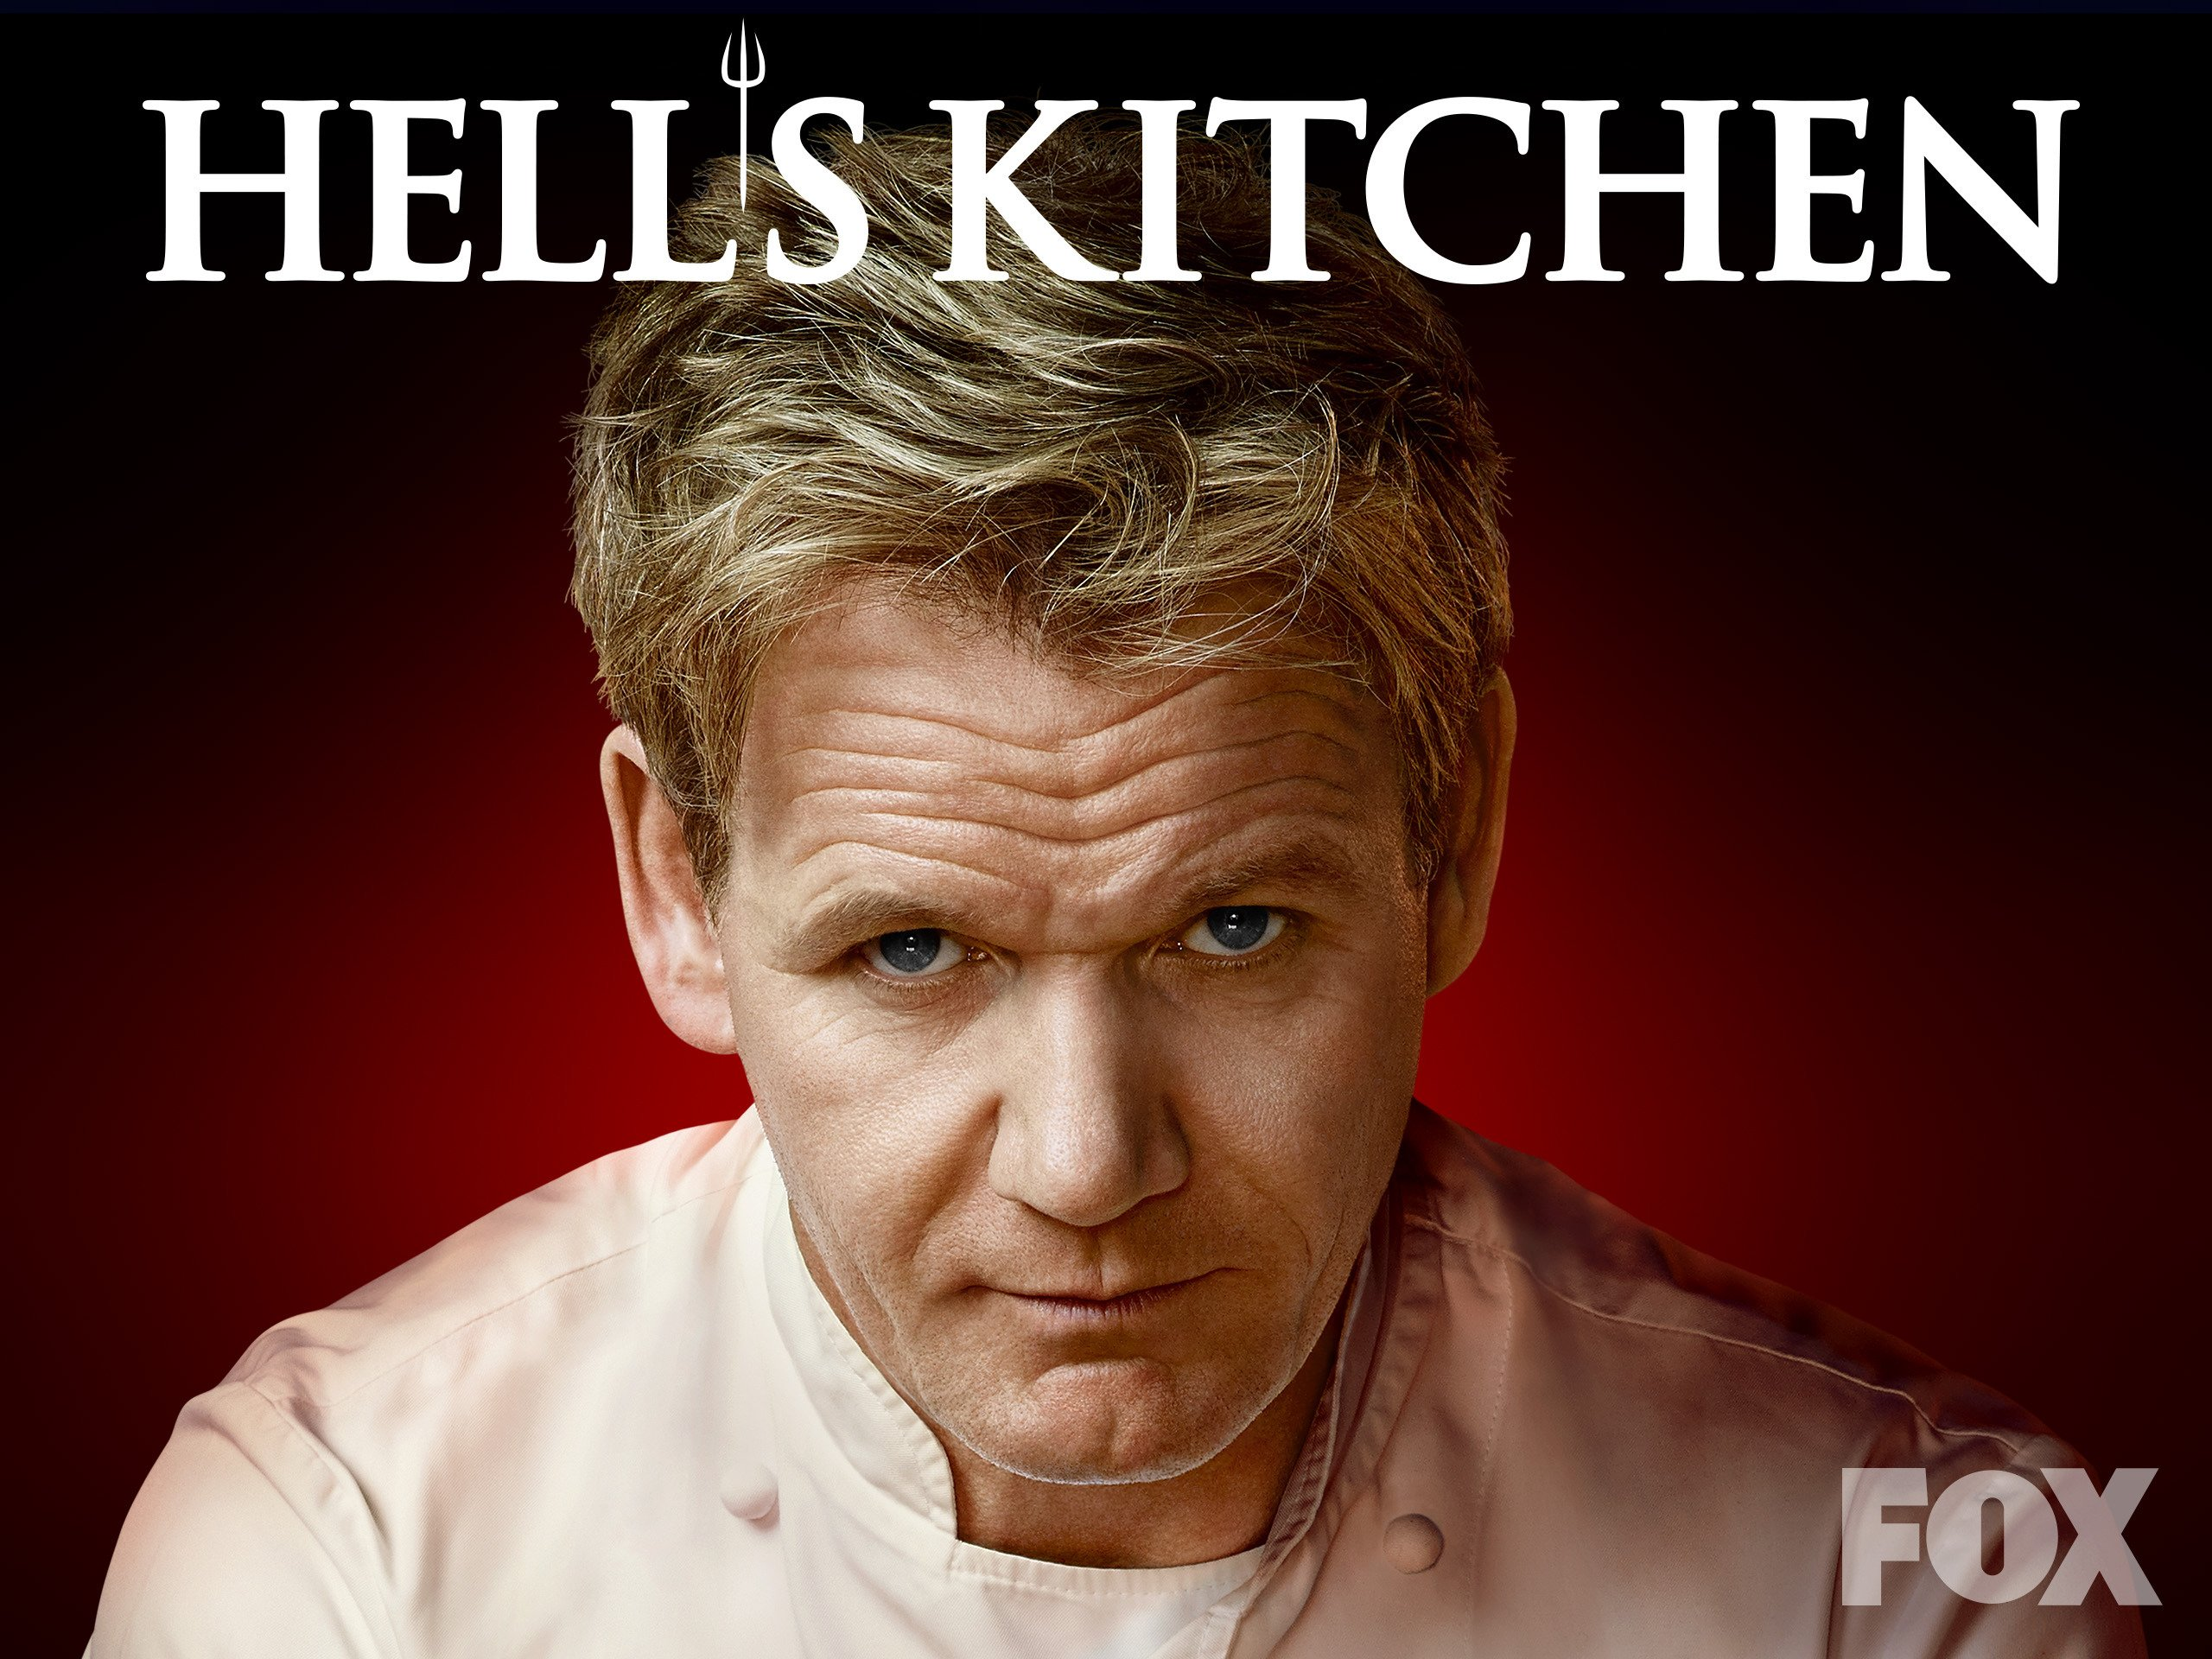 amazoncom hells kitchen season 15 amazon digital services llc - Hells Kitchen Season 13 2